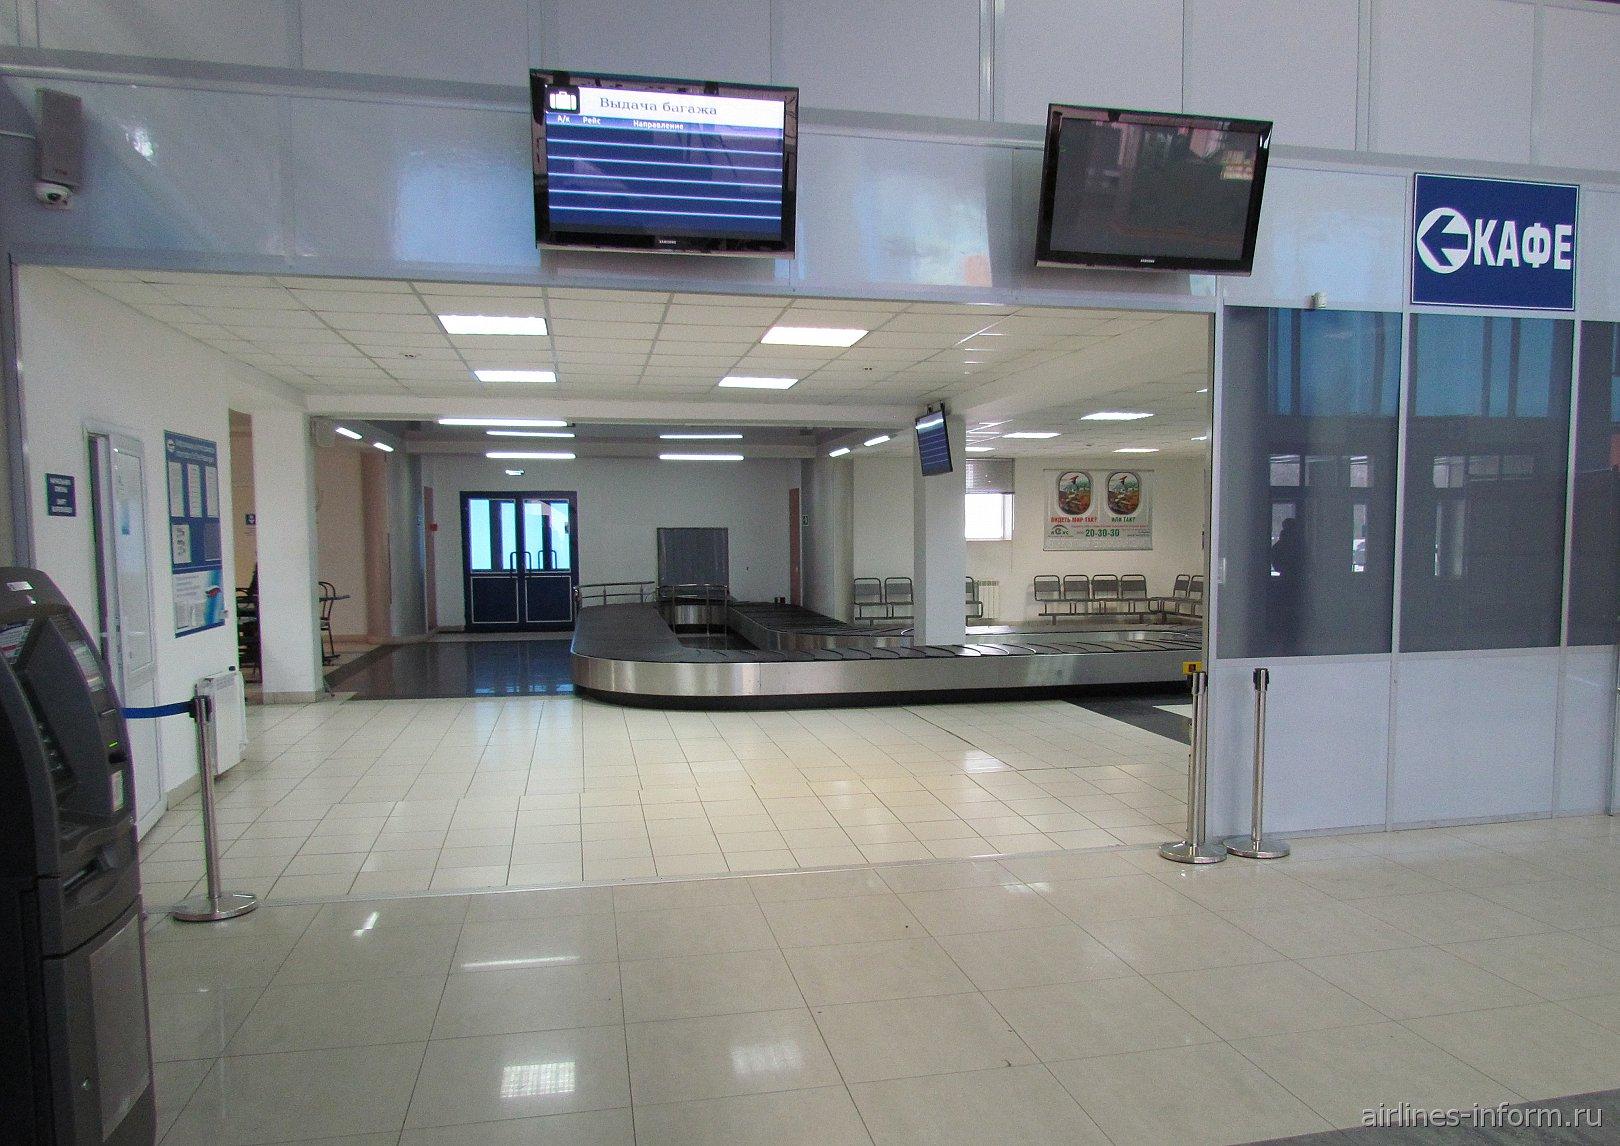 Зал выдачи багажа в аэропорту Архангельск Талаги